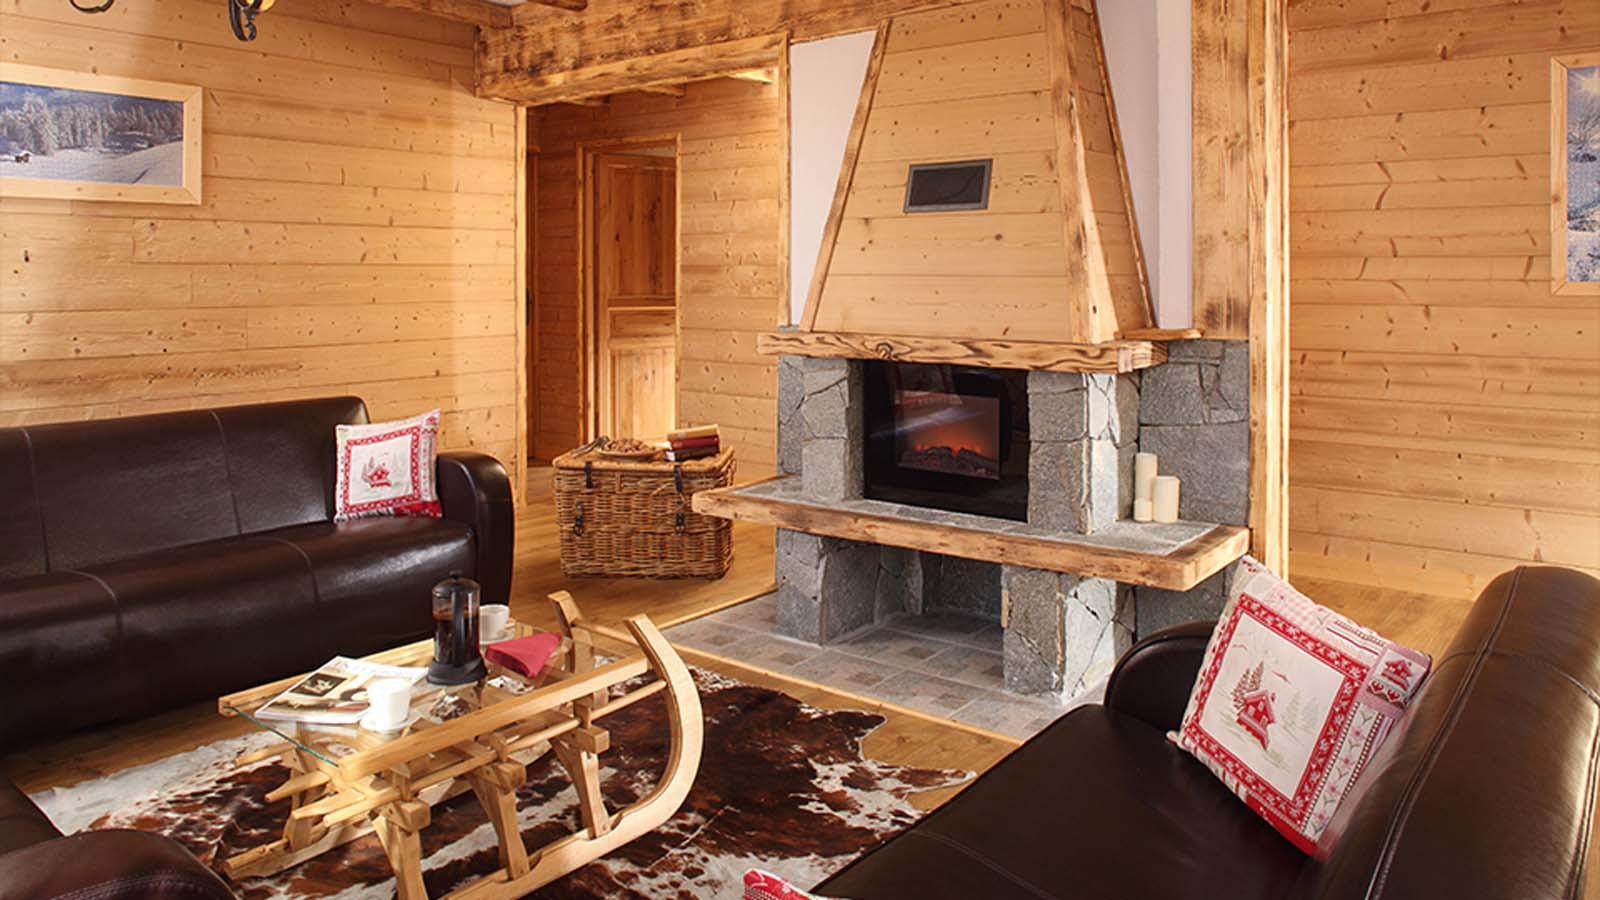 Lounge - Chalet Naomi, Alpe D'Huez, France